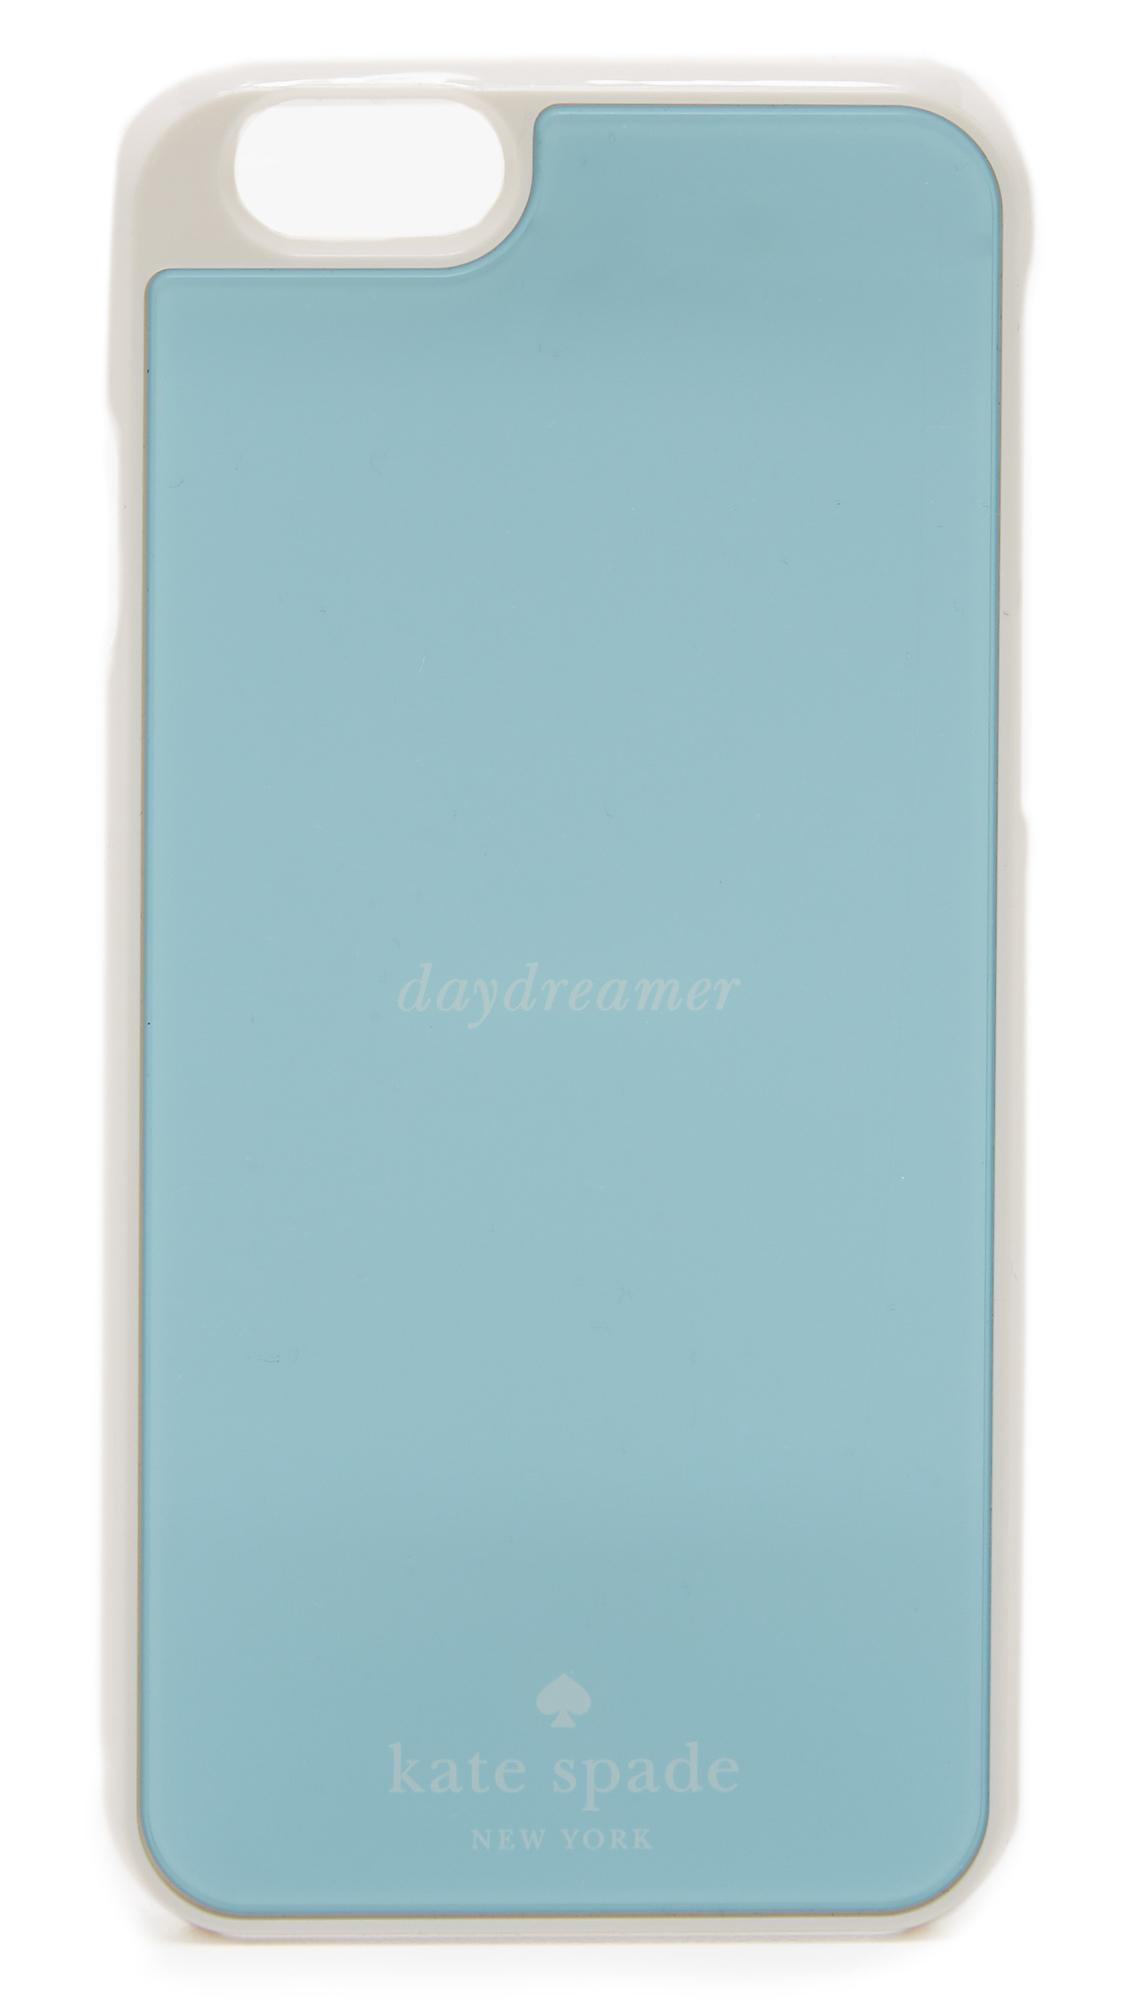 timeless design dd34e fbbf6 kate spade new york White Daydreamer Mirror Iphone 6 / 6s Case